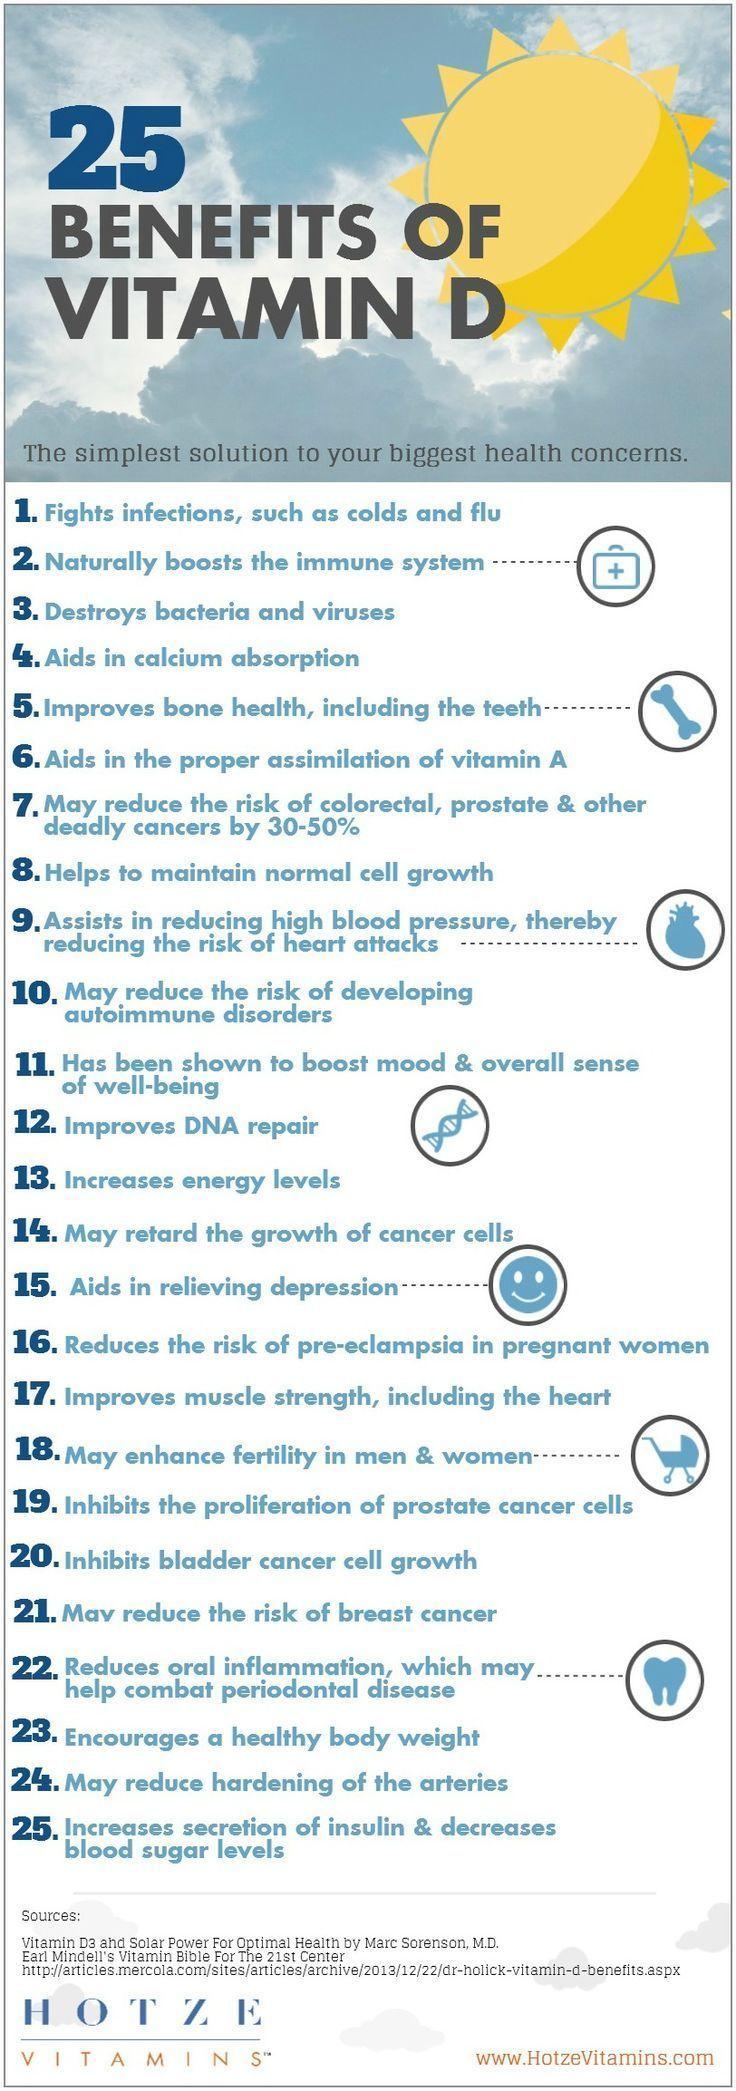 Best 25+ Vitamin d ideas on Pinterest | Vitamin d deficiency ...